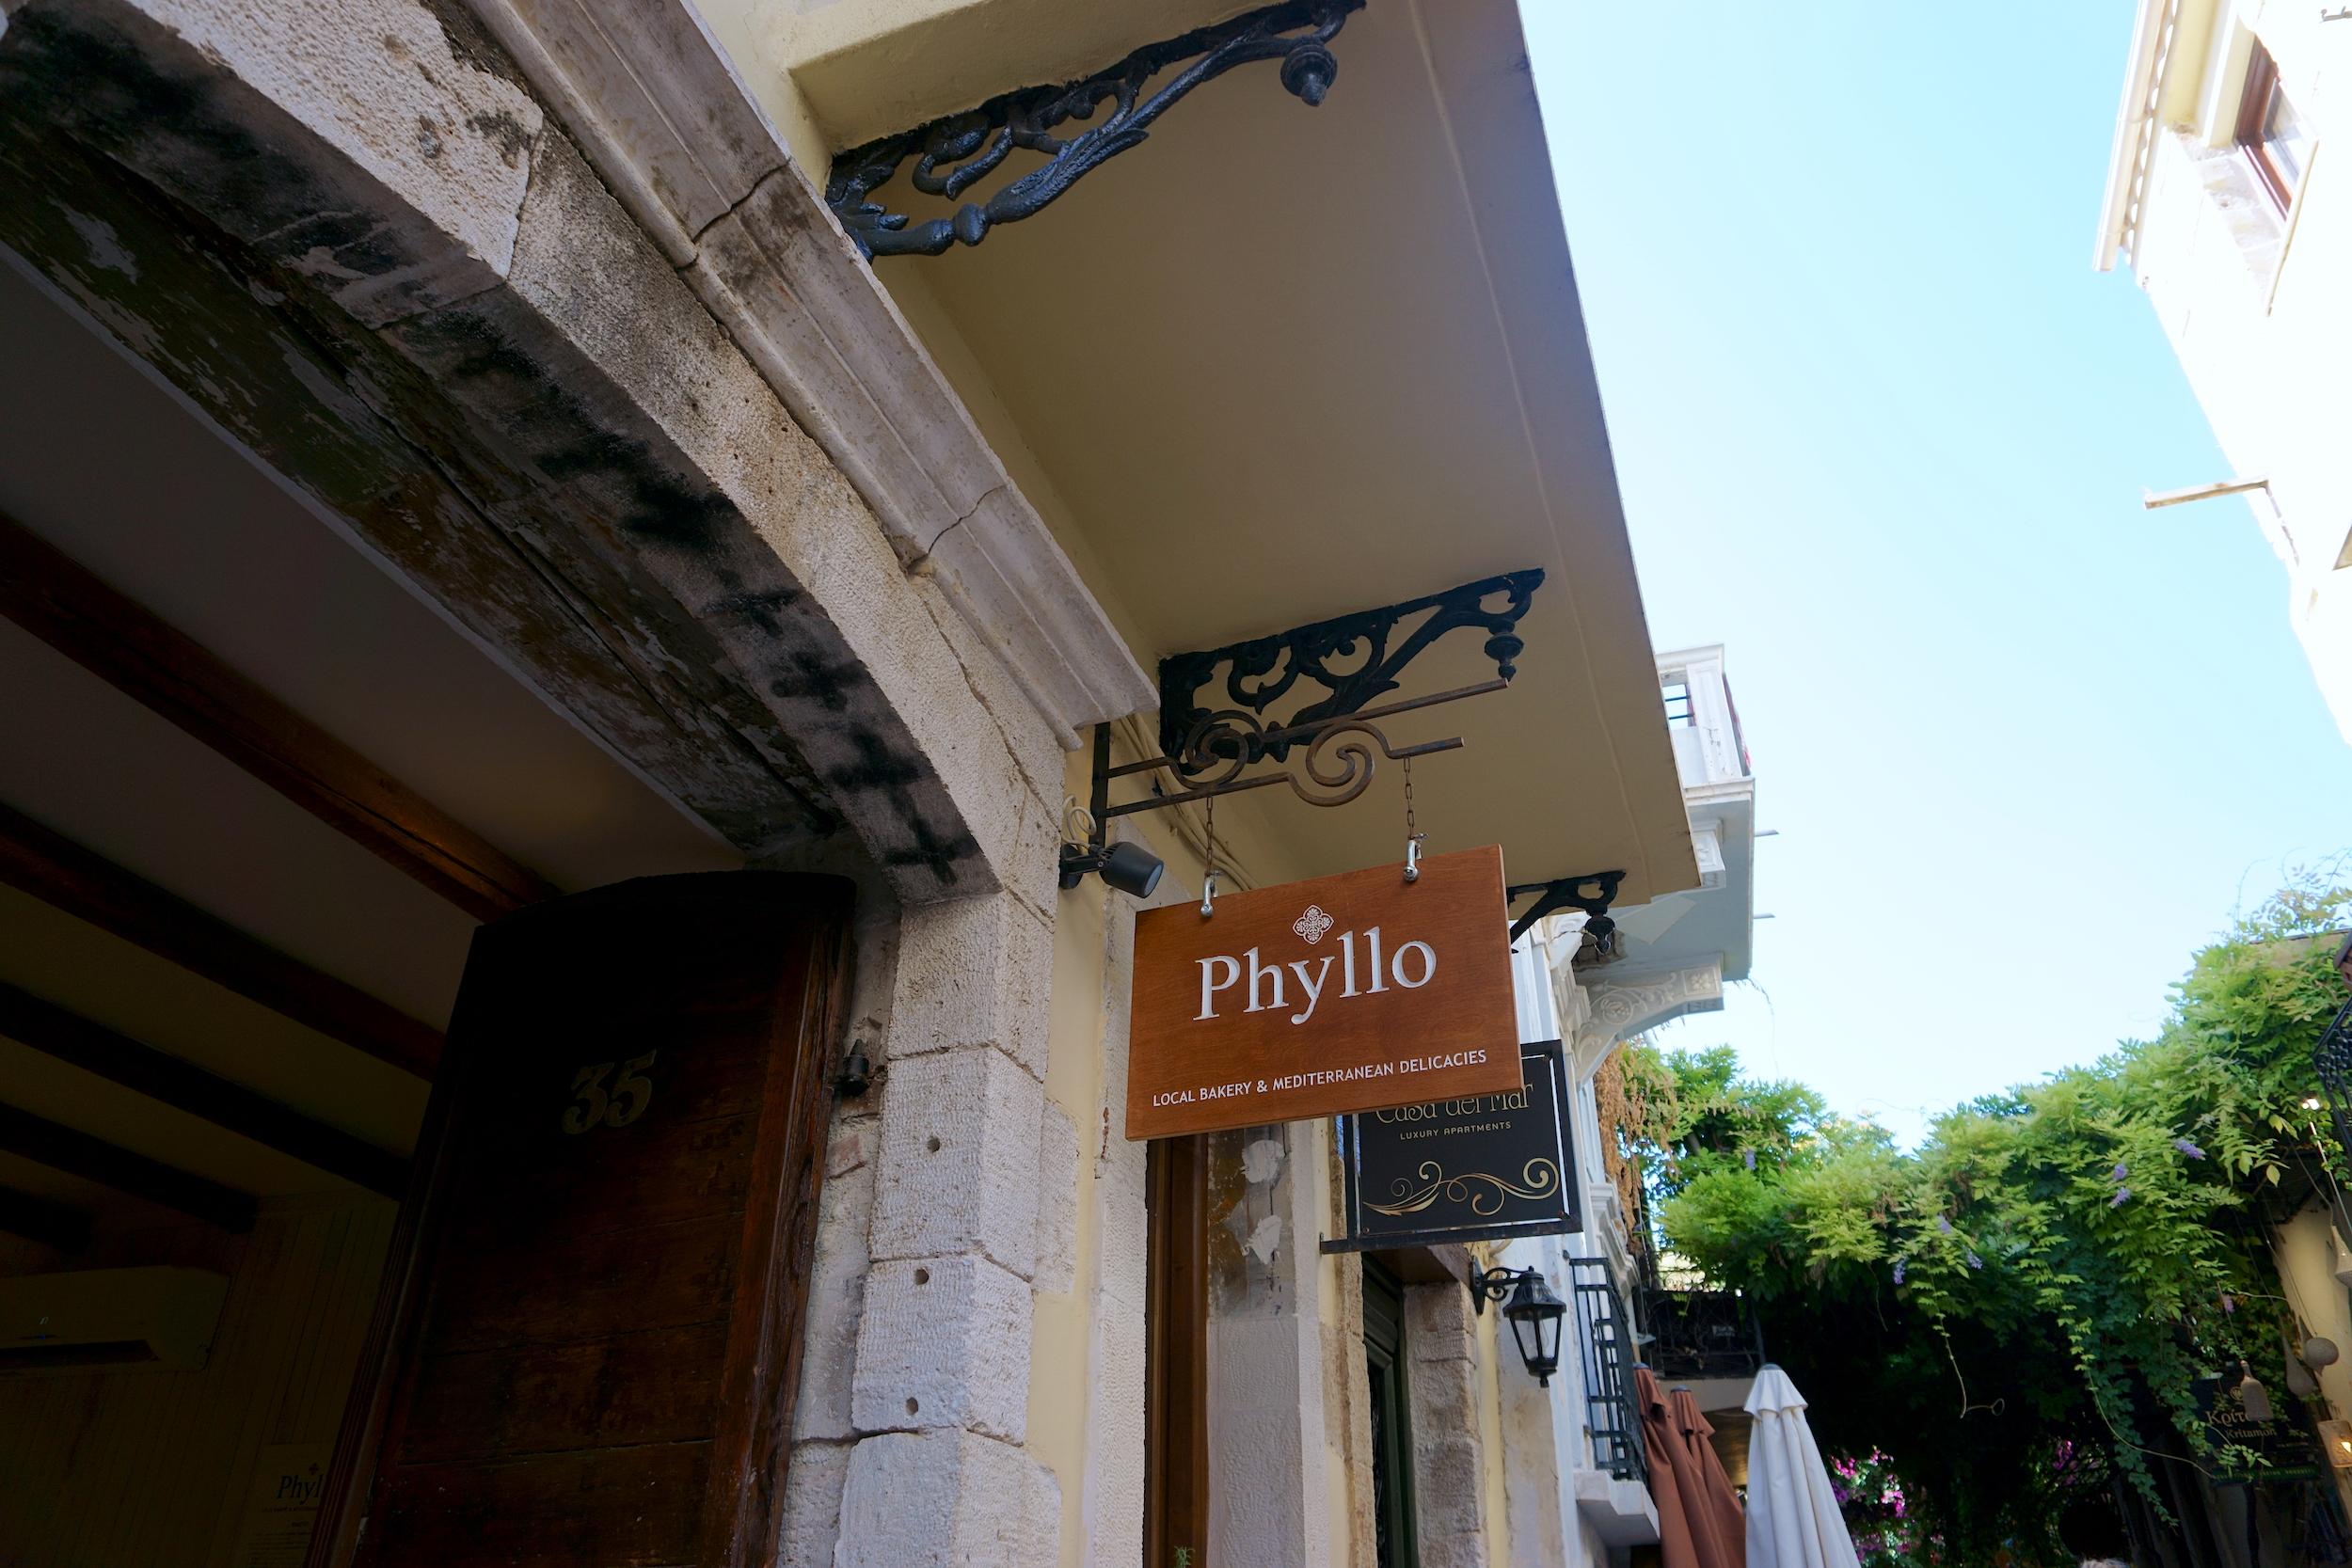 Phyllo-Chania.JPG